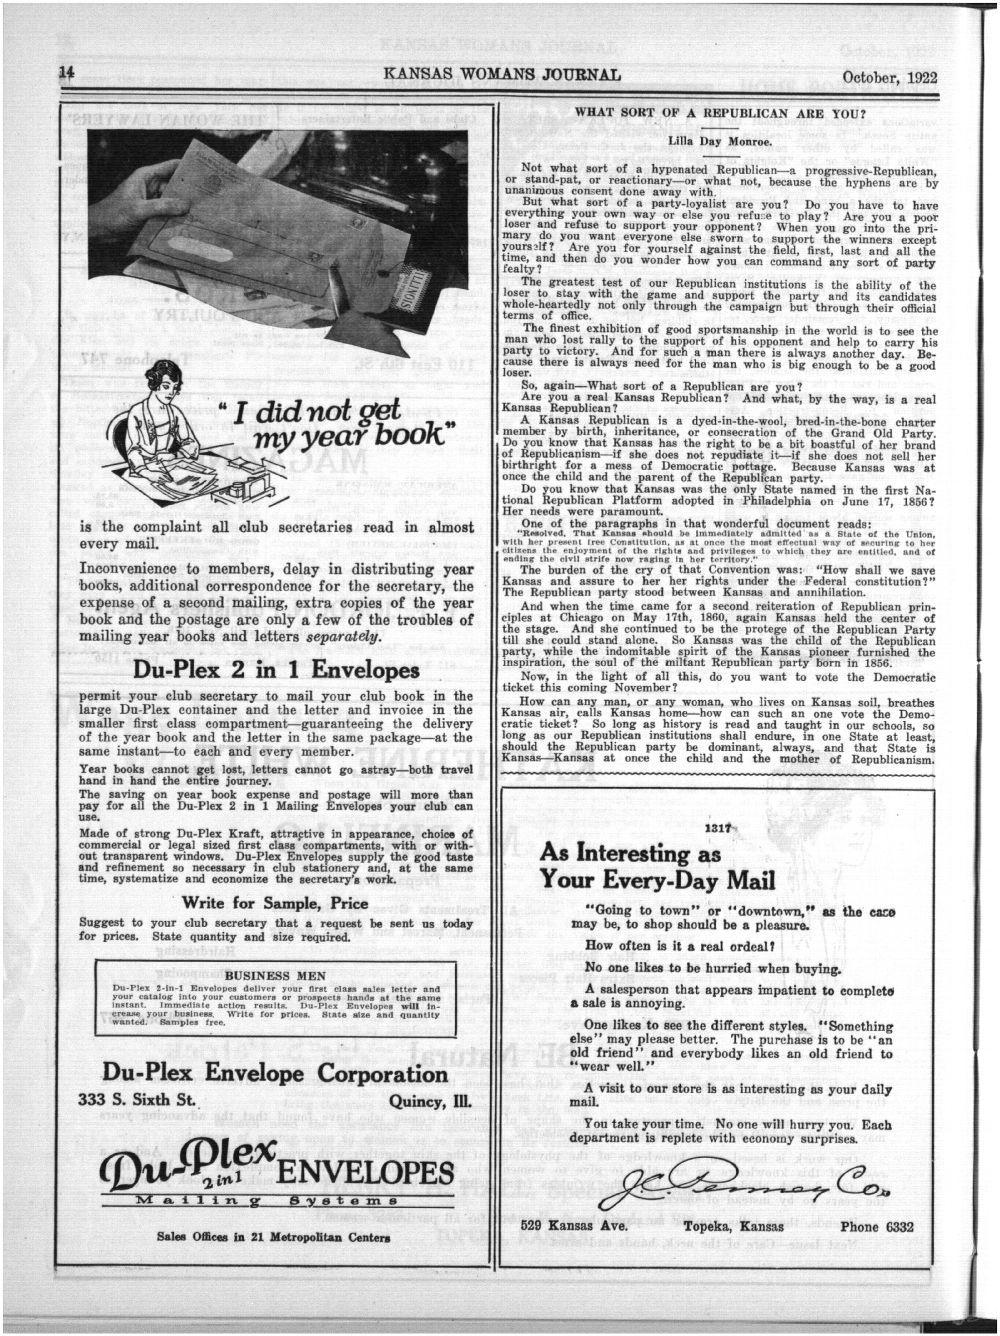 Kansas Womans Journal, October, 1922 - 14